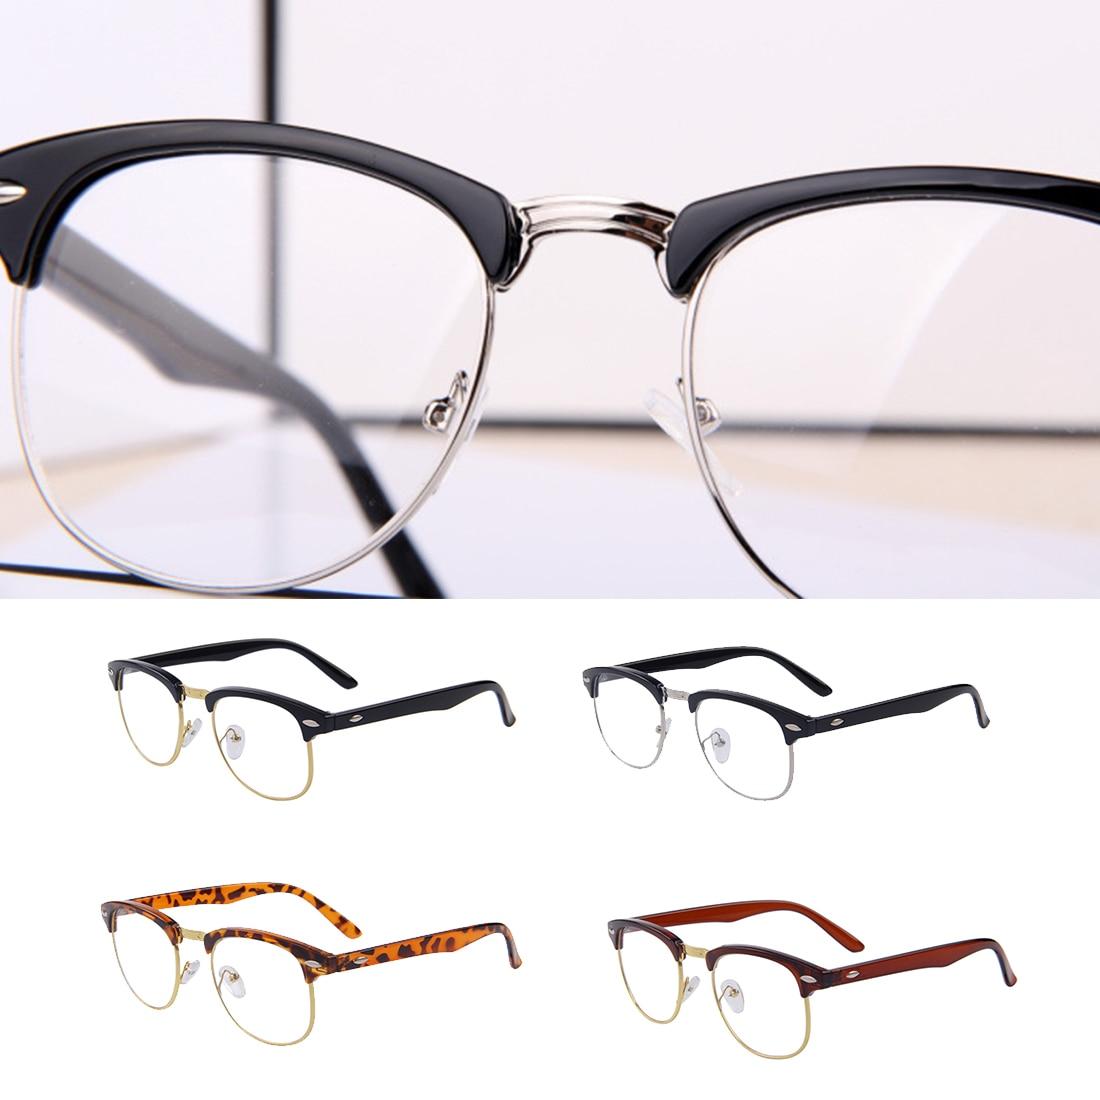 1a411ef4b20c Fashion Candy Color Frame Eyeglasses Nerd Glasses 9 Colors Unisex Men Women  Eyewear Frames ...